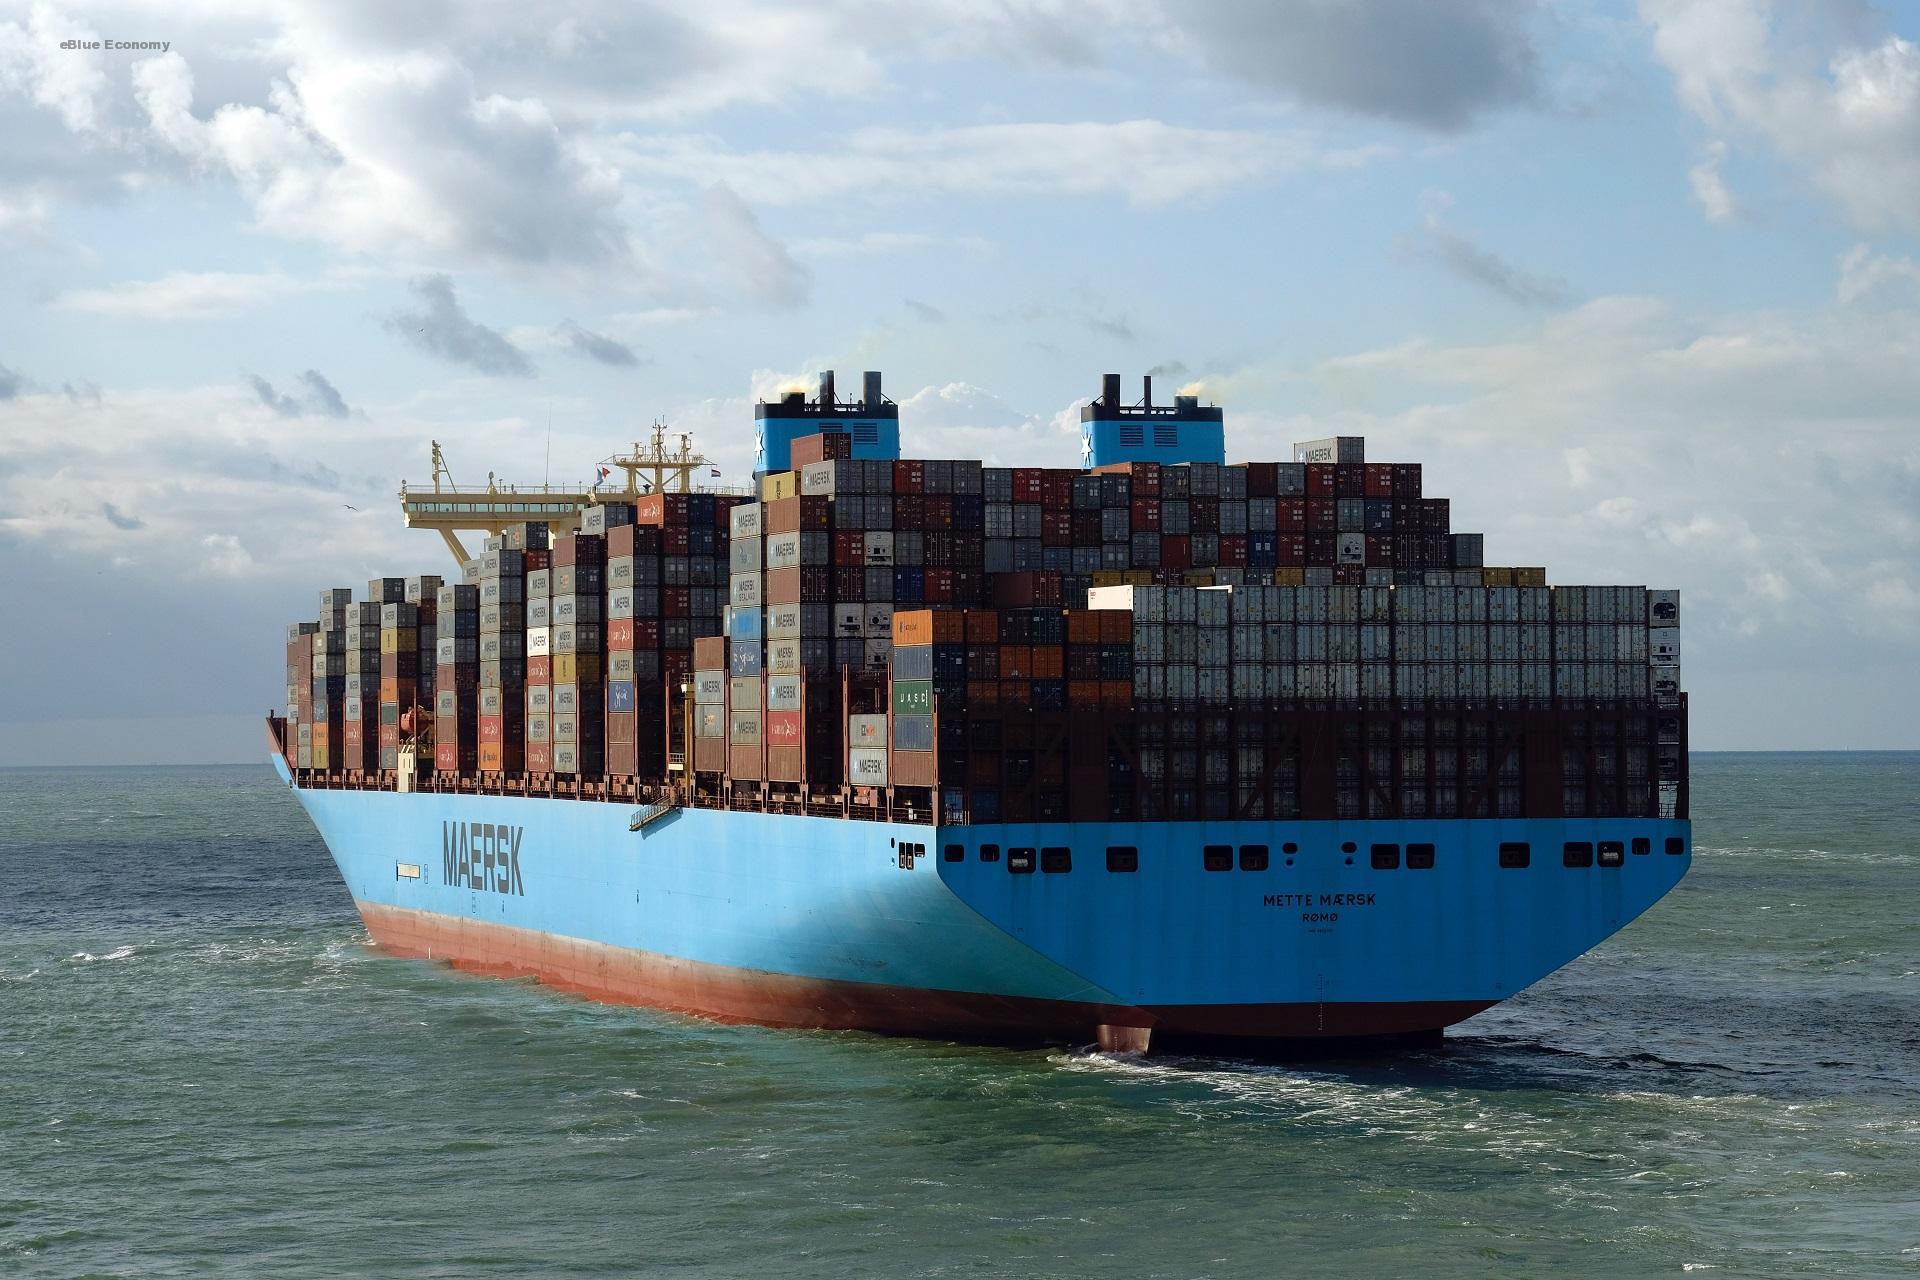 eBlue_economy_Mitsui joins Maersk Mc-Kinney Moller Center for Zero Carbon Shipping